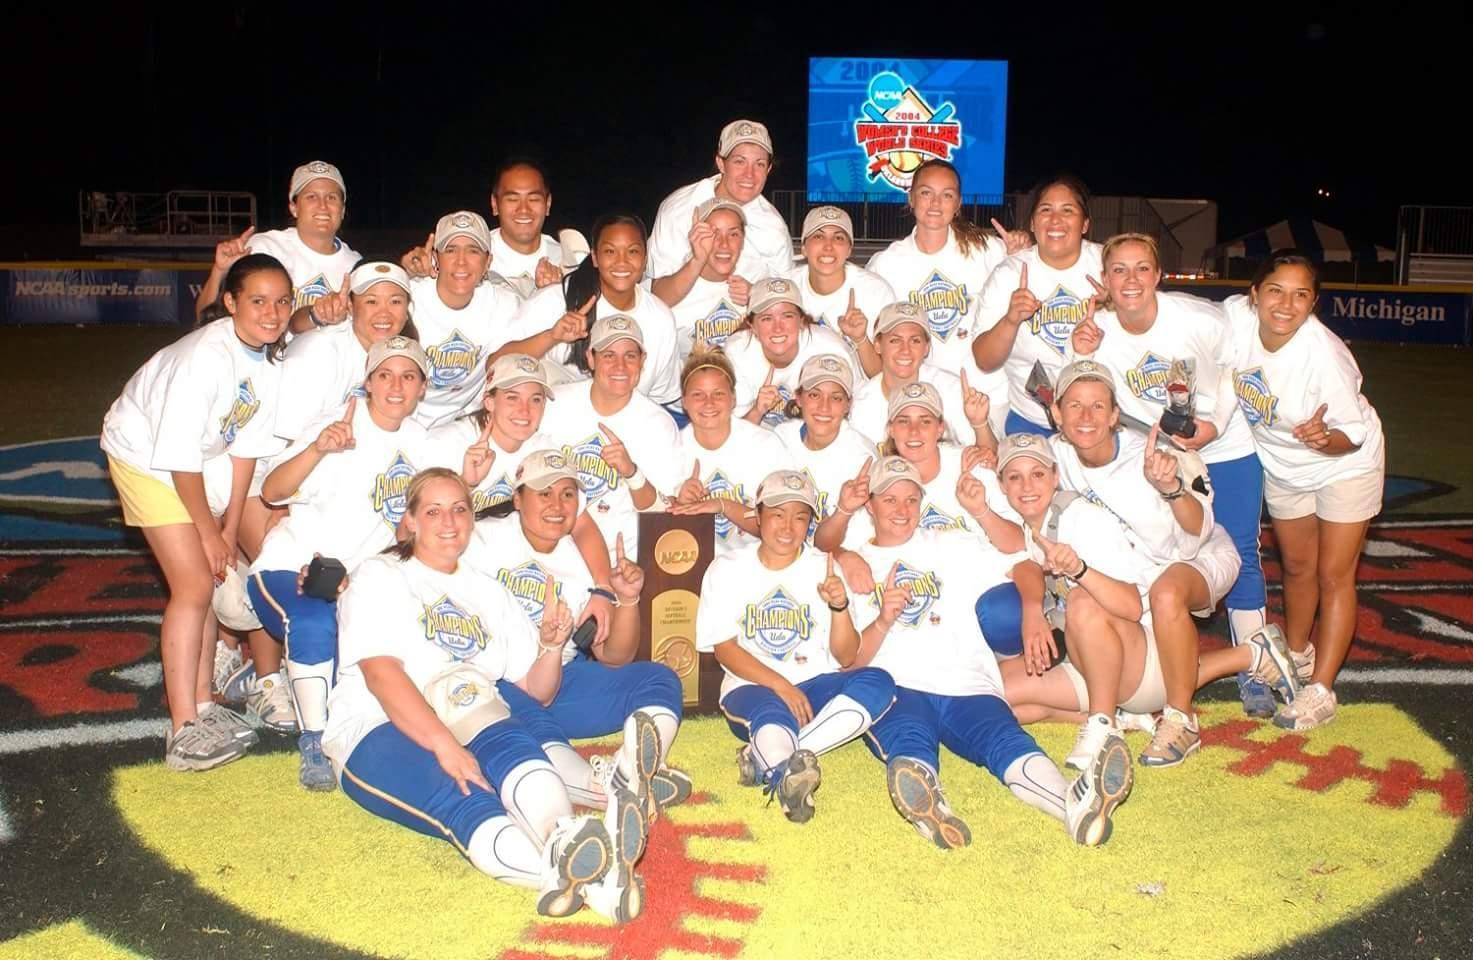 2004 UCLA Softball